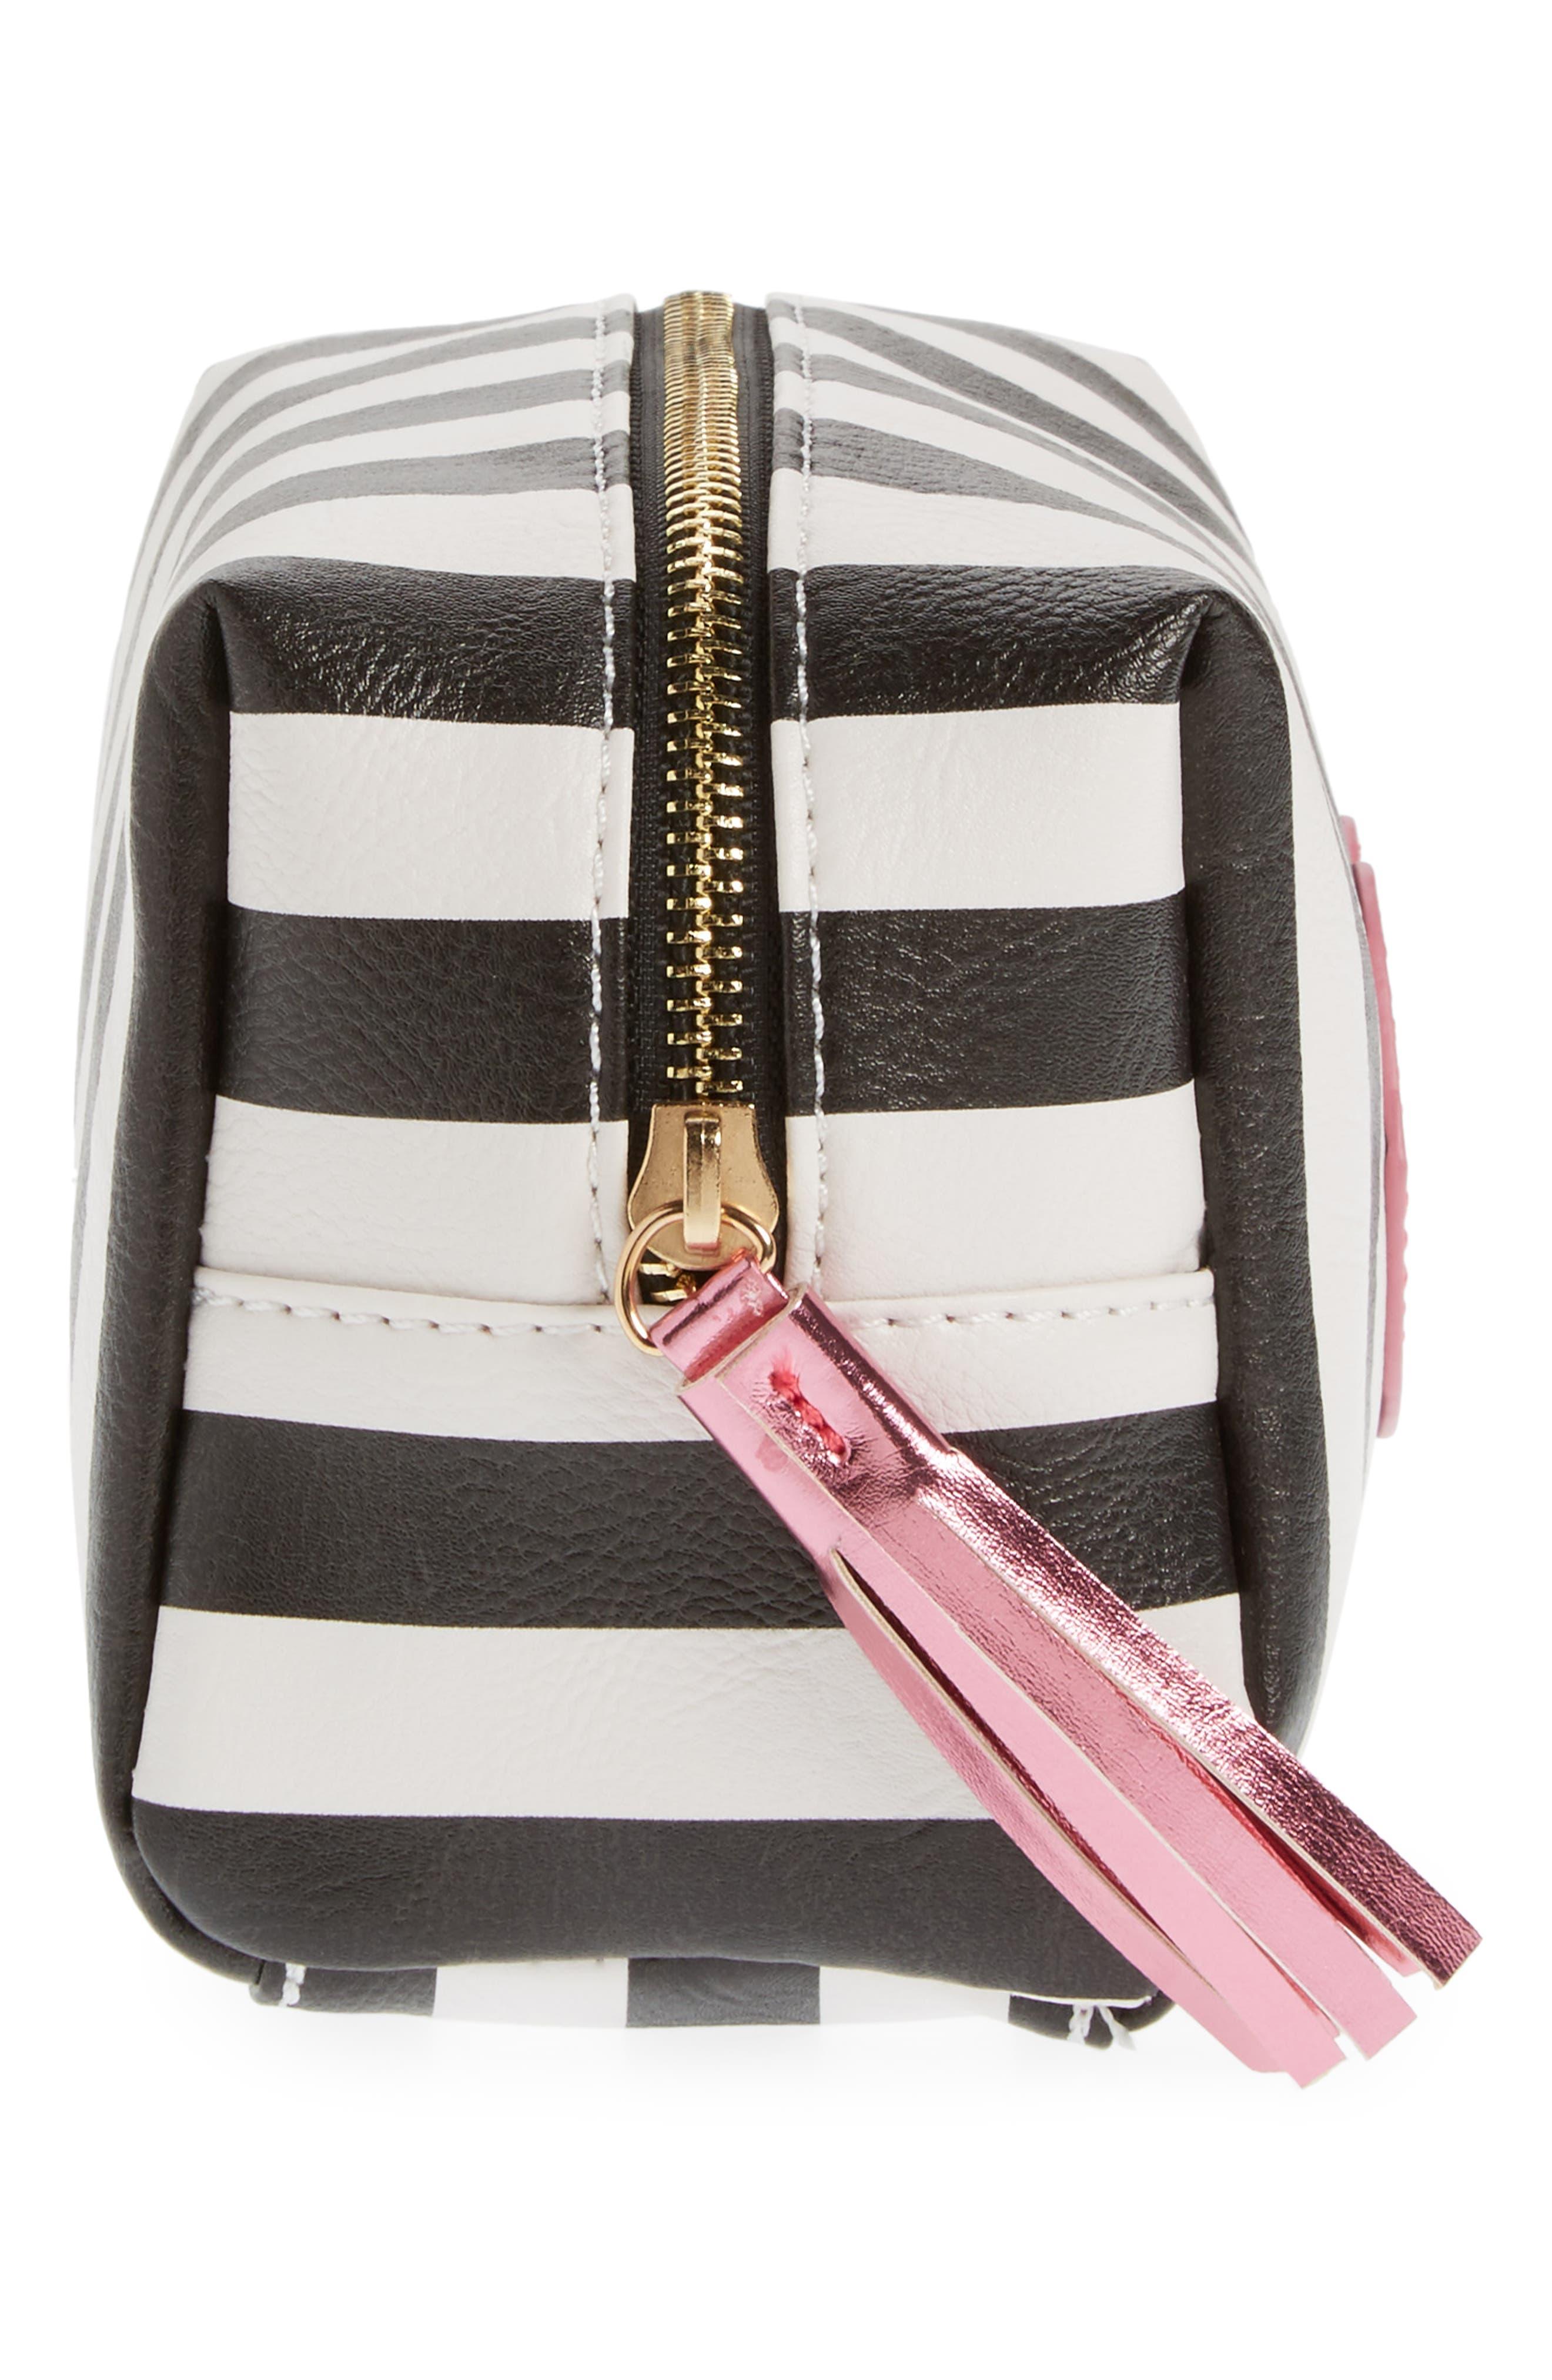 Metallic Lip Stripe Cosmetics Bag,                             Alternate thumbnail 4, color,                             001